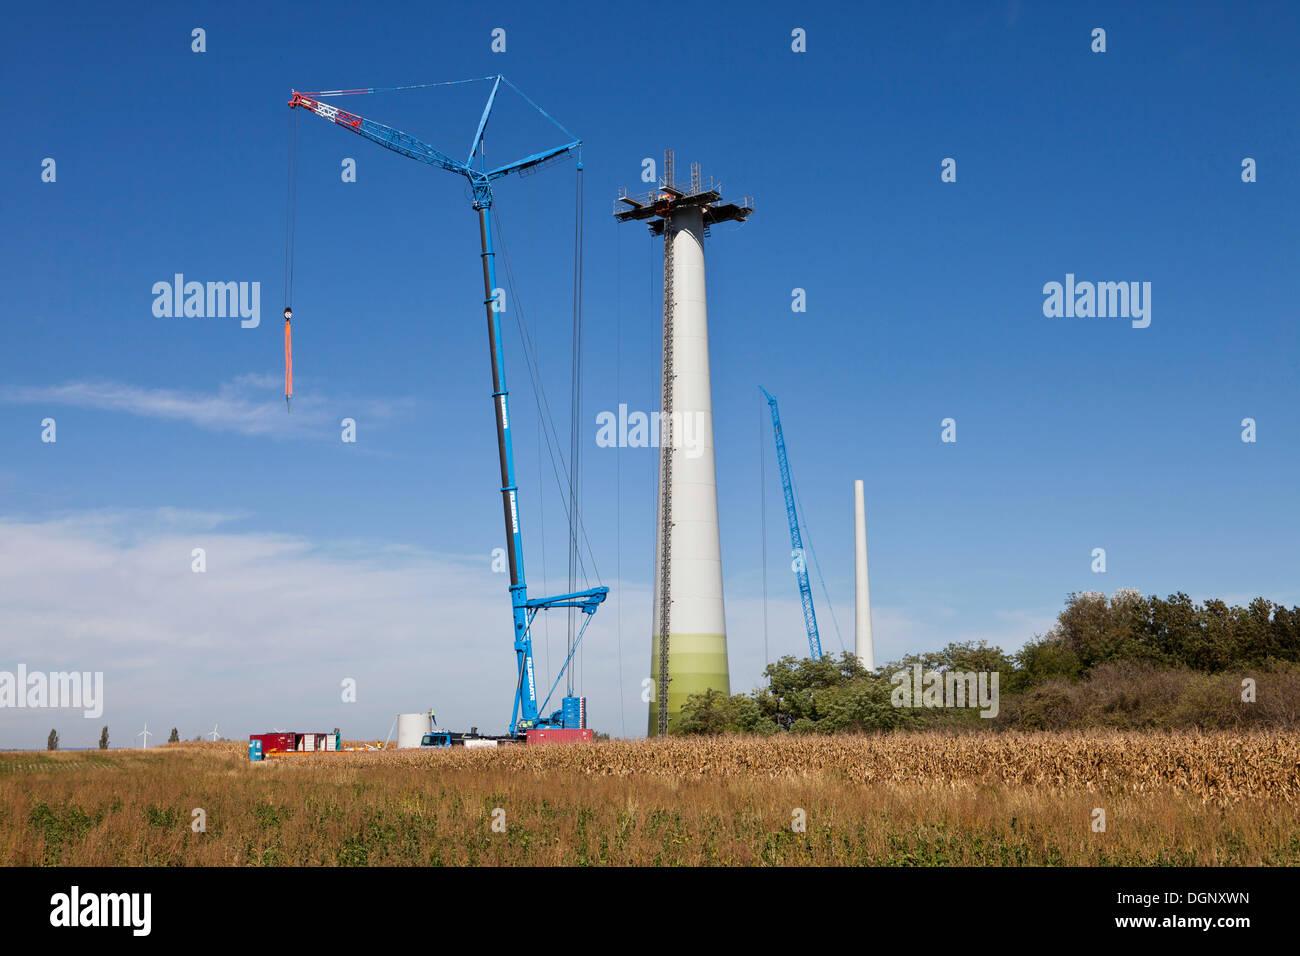 Construction of an Enercon E82 wind turbine, Windpark Grosshofen wind farm, Marchfeld, Lower Austria, Austria, Europe Stock Photo